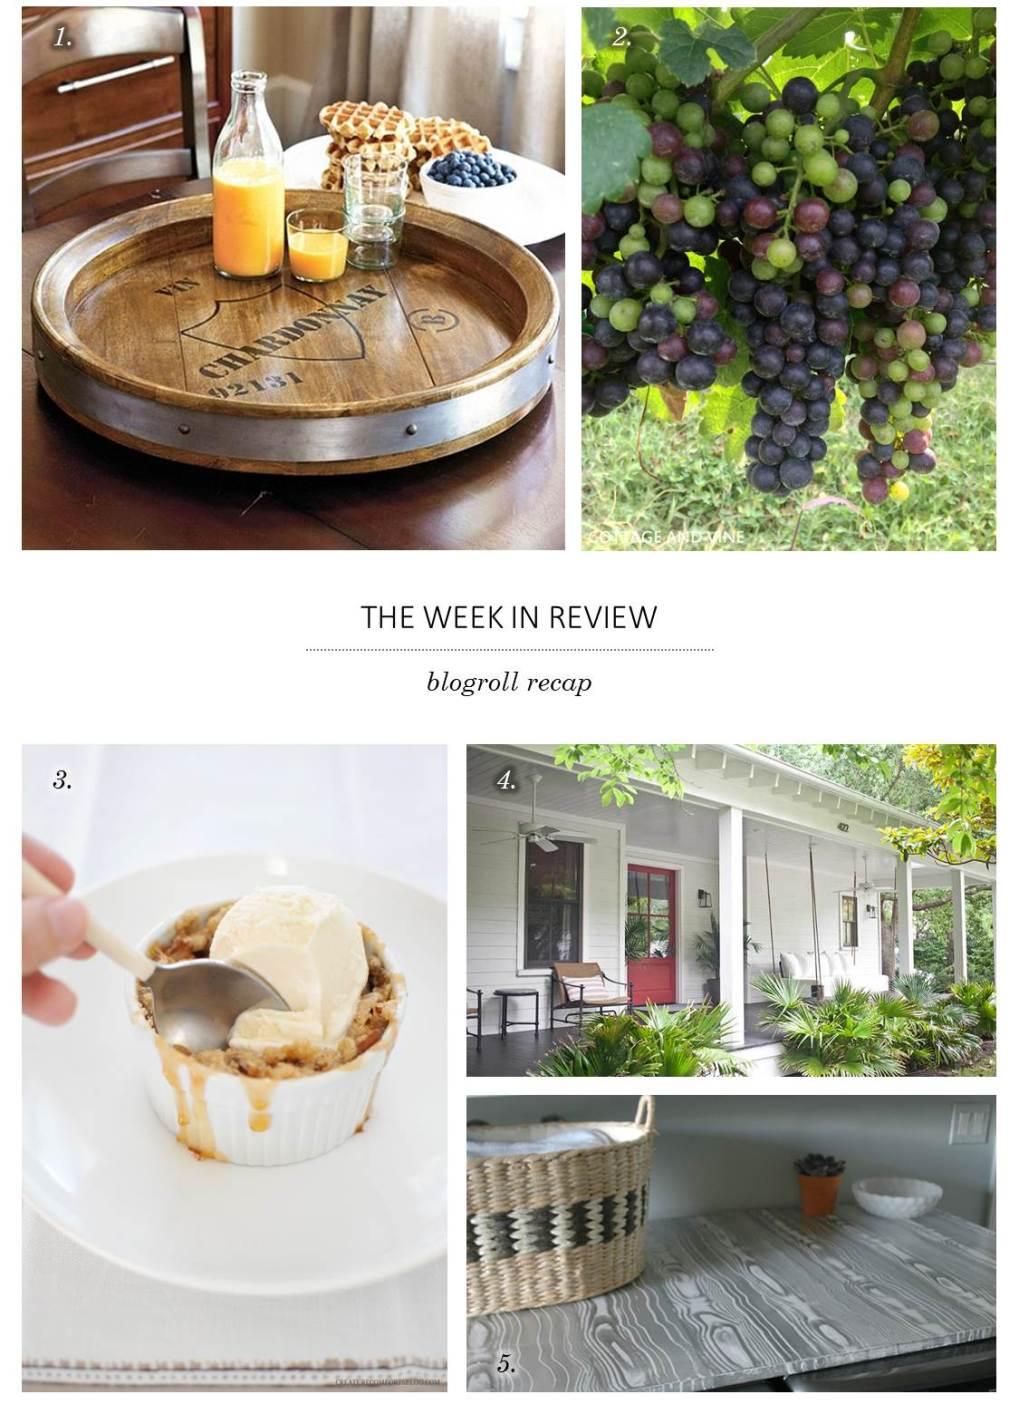 WhereWeAreBlog Week in Review